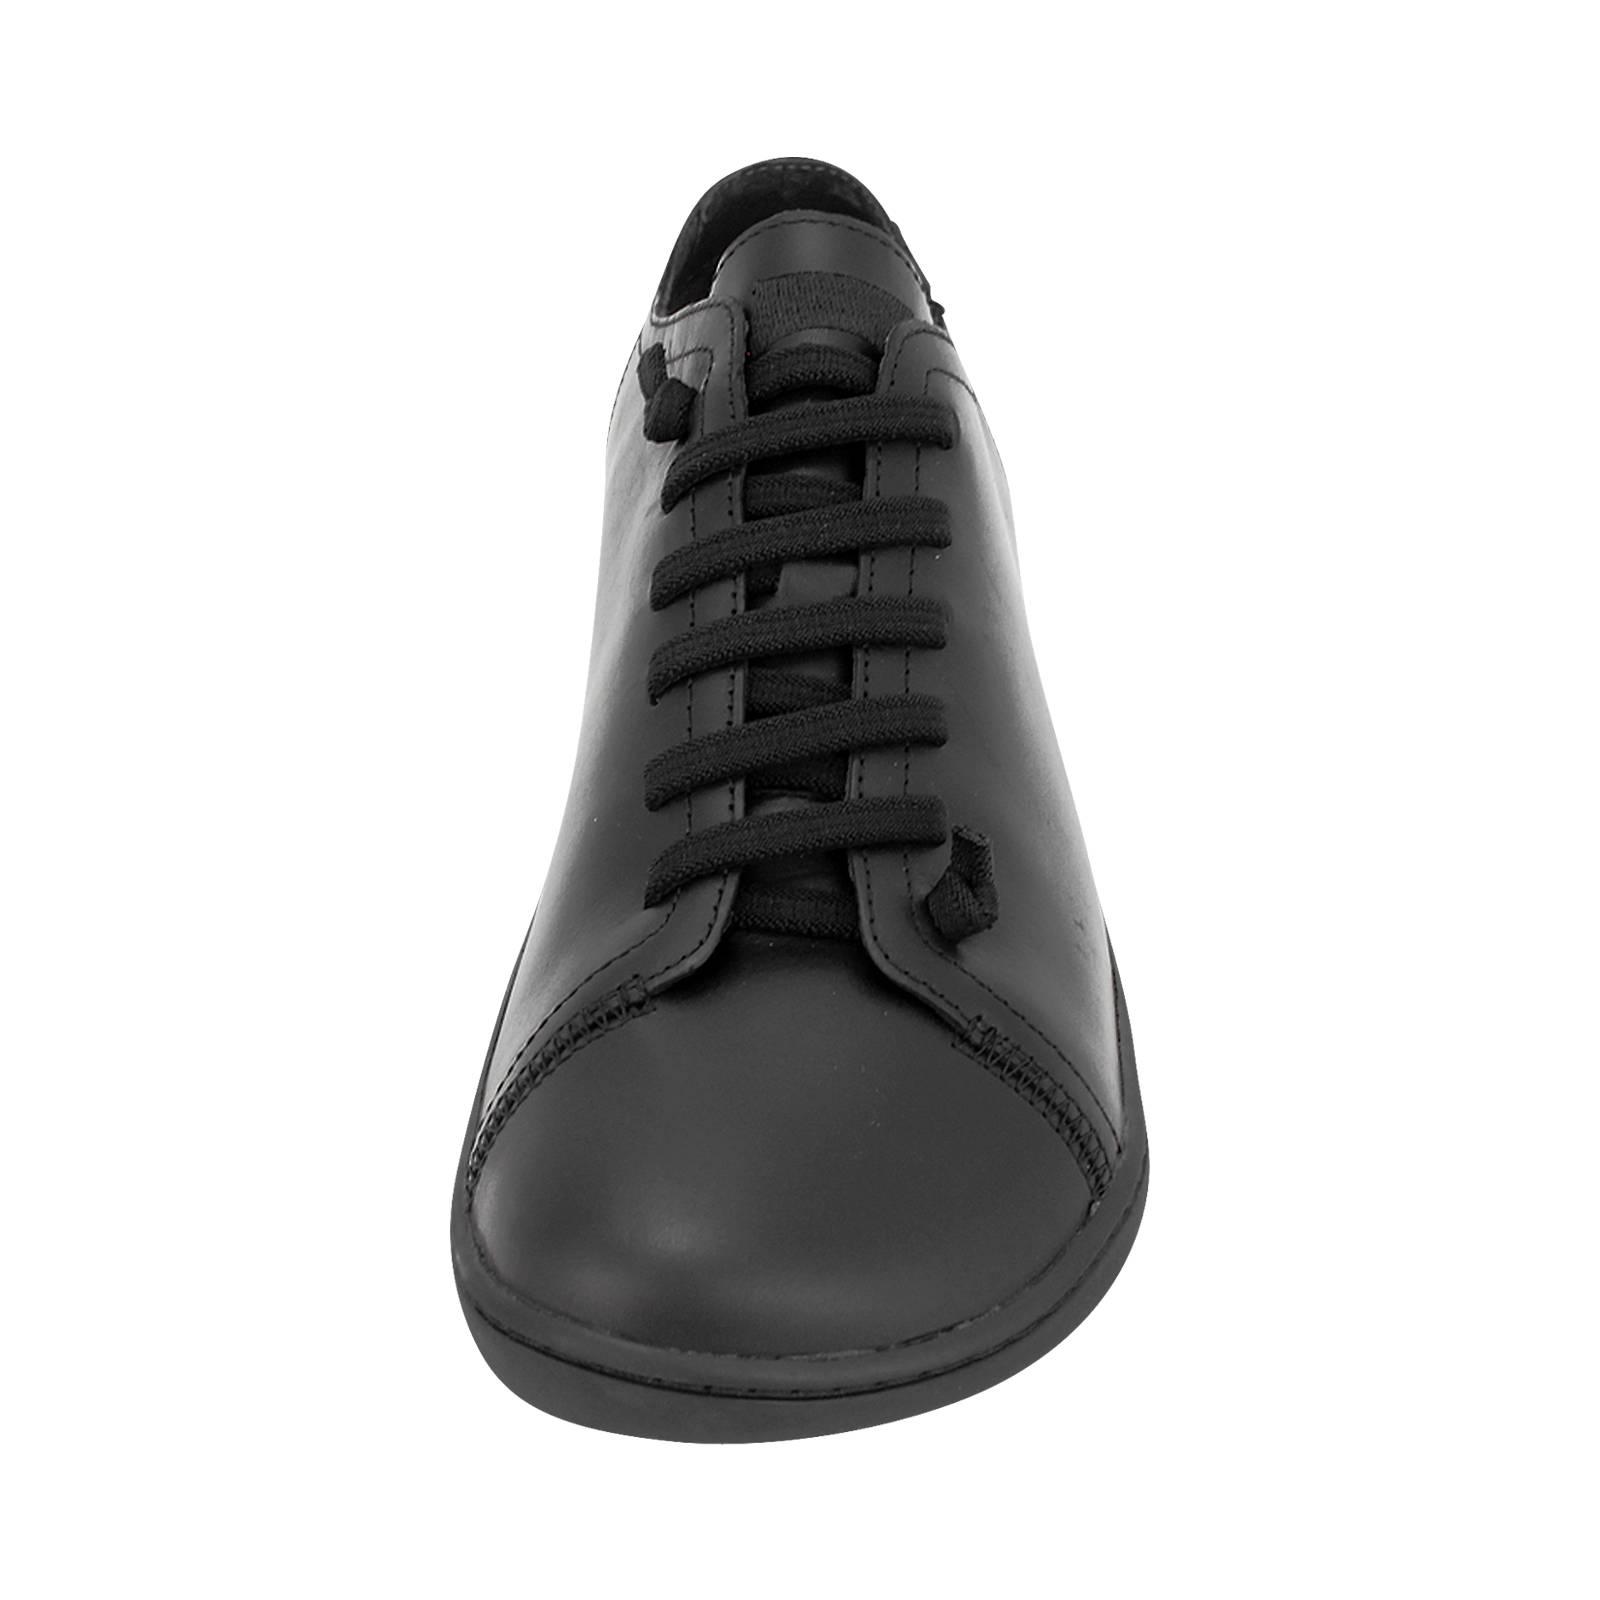 4d1bac46b2 Peu Cami 17665 - Ανδρικά παπούτσια casual Camper από δέρμα - Gianna ...